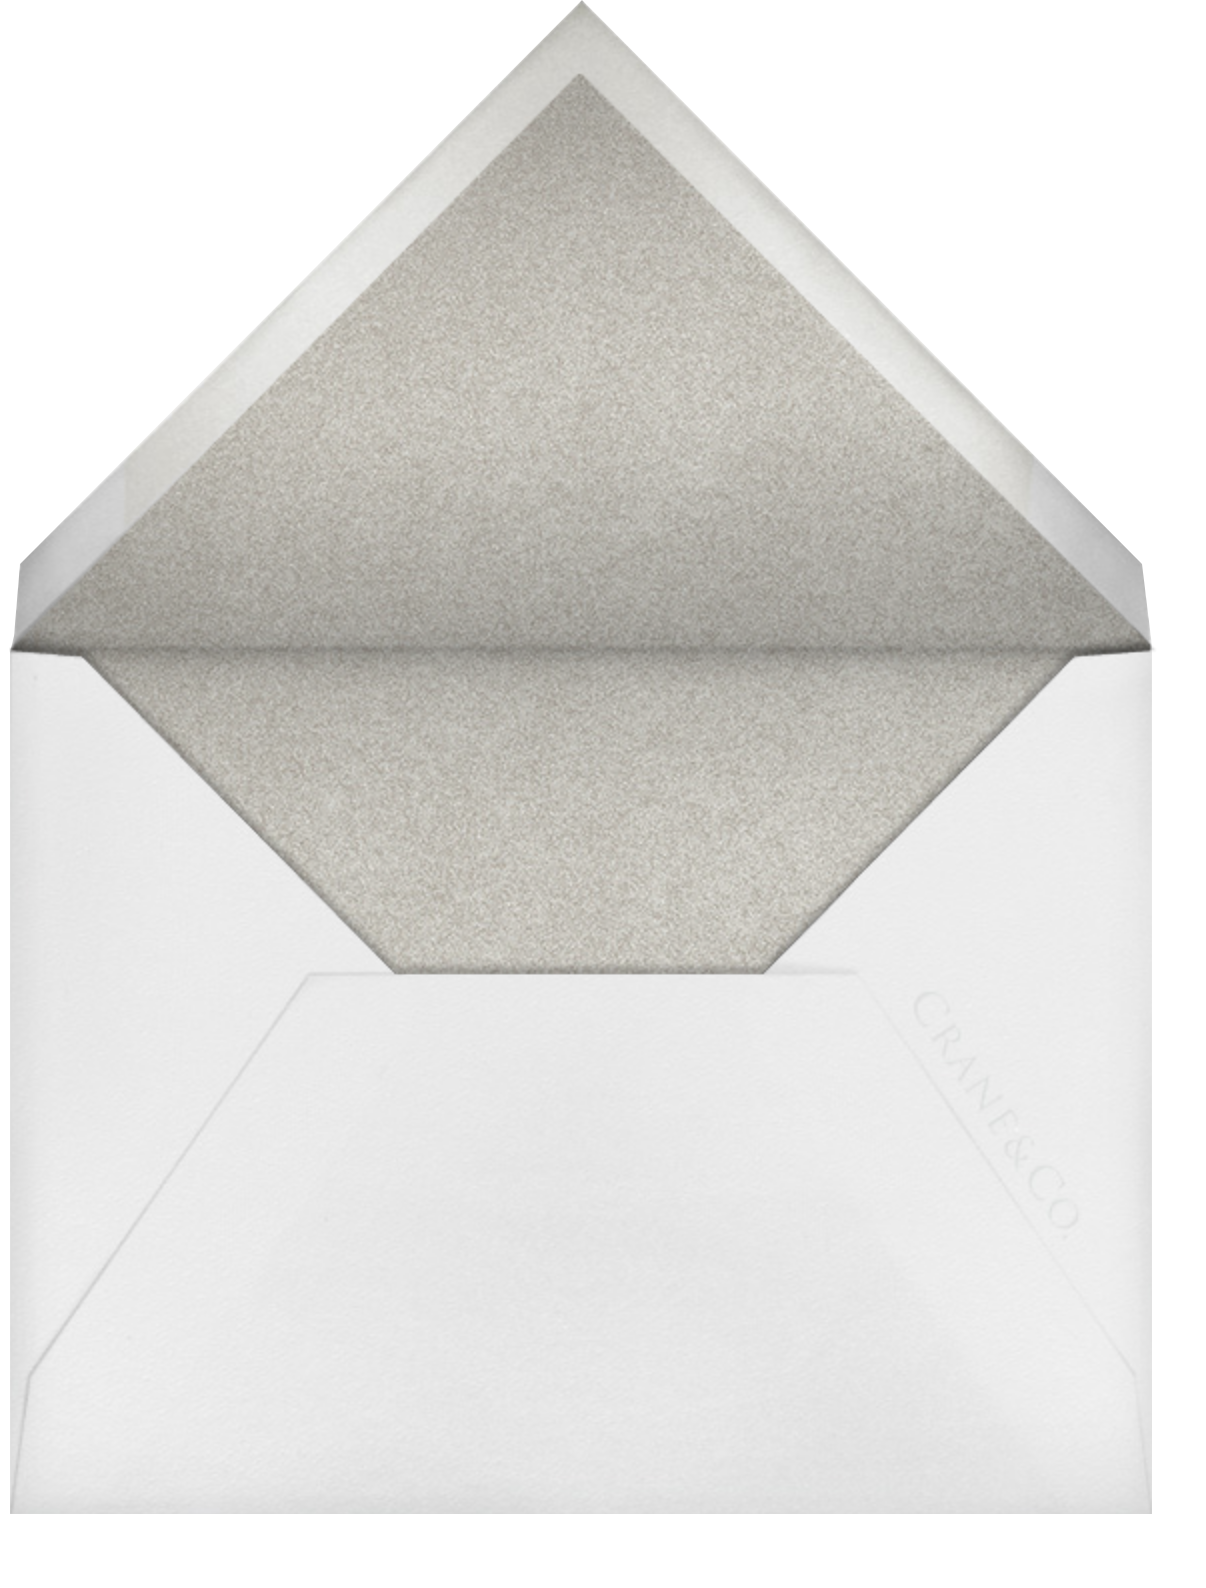 Polka Dot - Platinum - Oscar de la Renta - Engagement party - envelope back